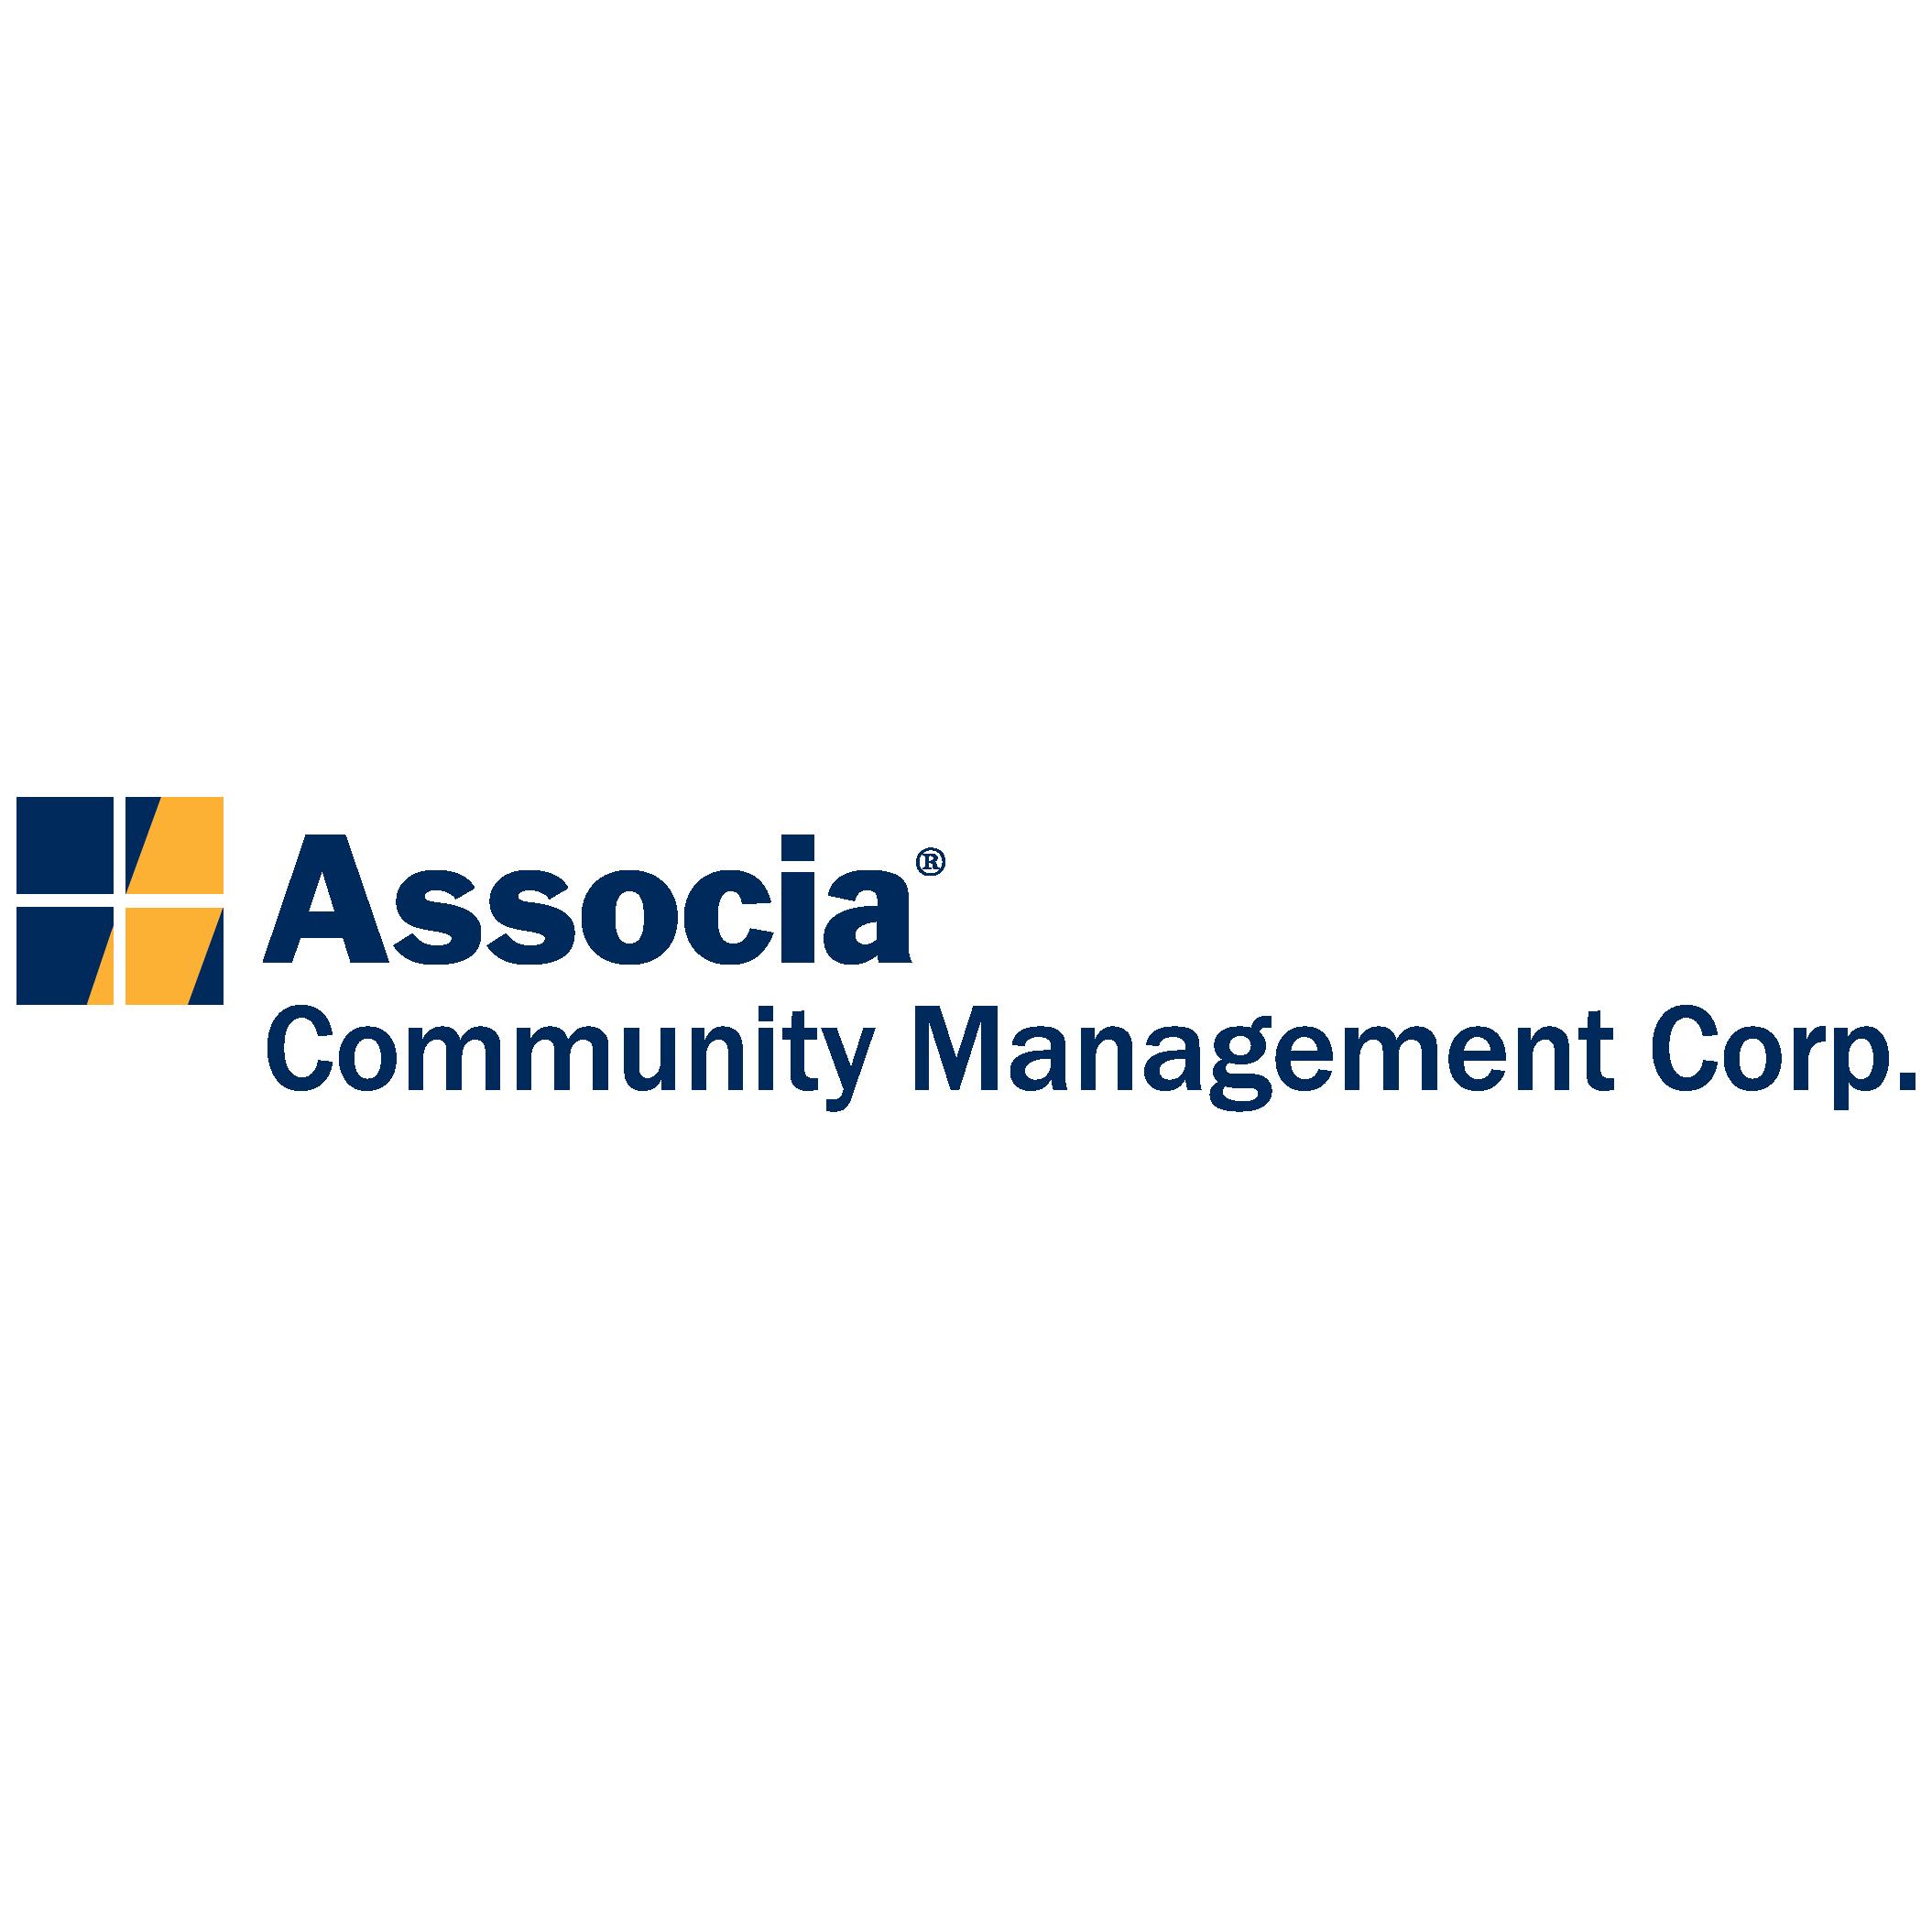 Associa-Community Management Corp.